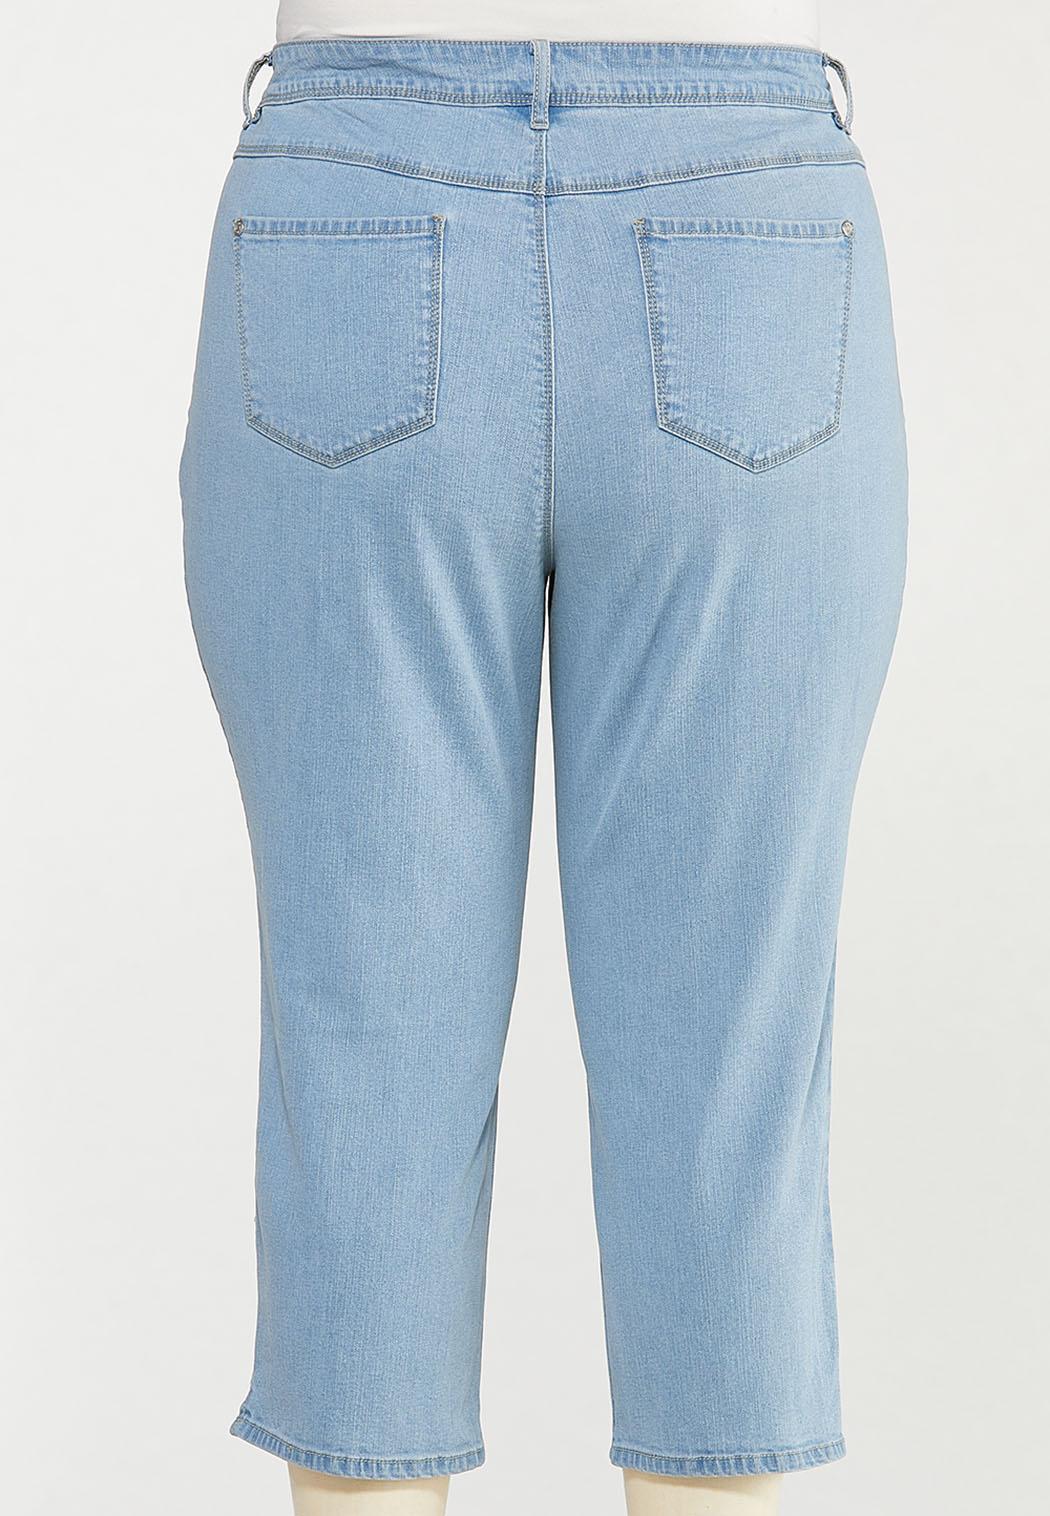 Plus Size Cropped Lightwash Skinny Jeans (Item #44508603)